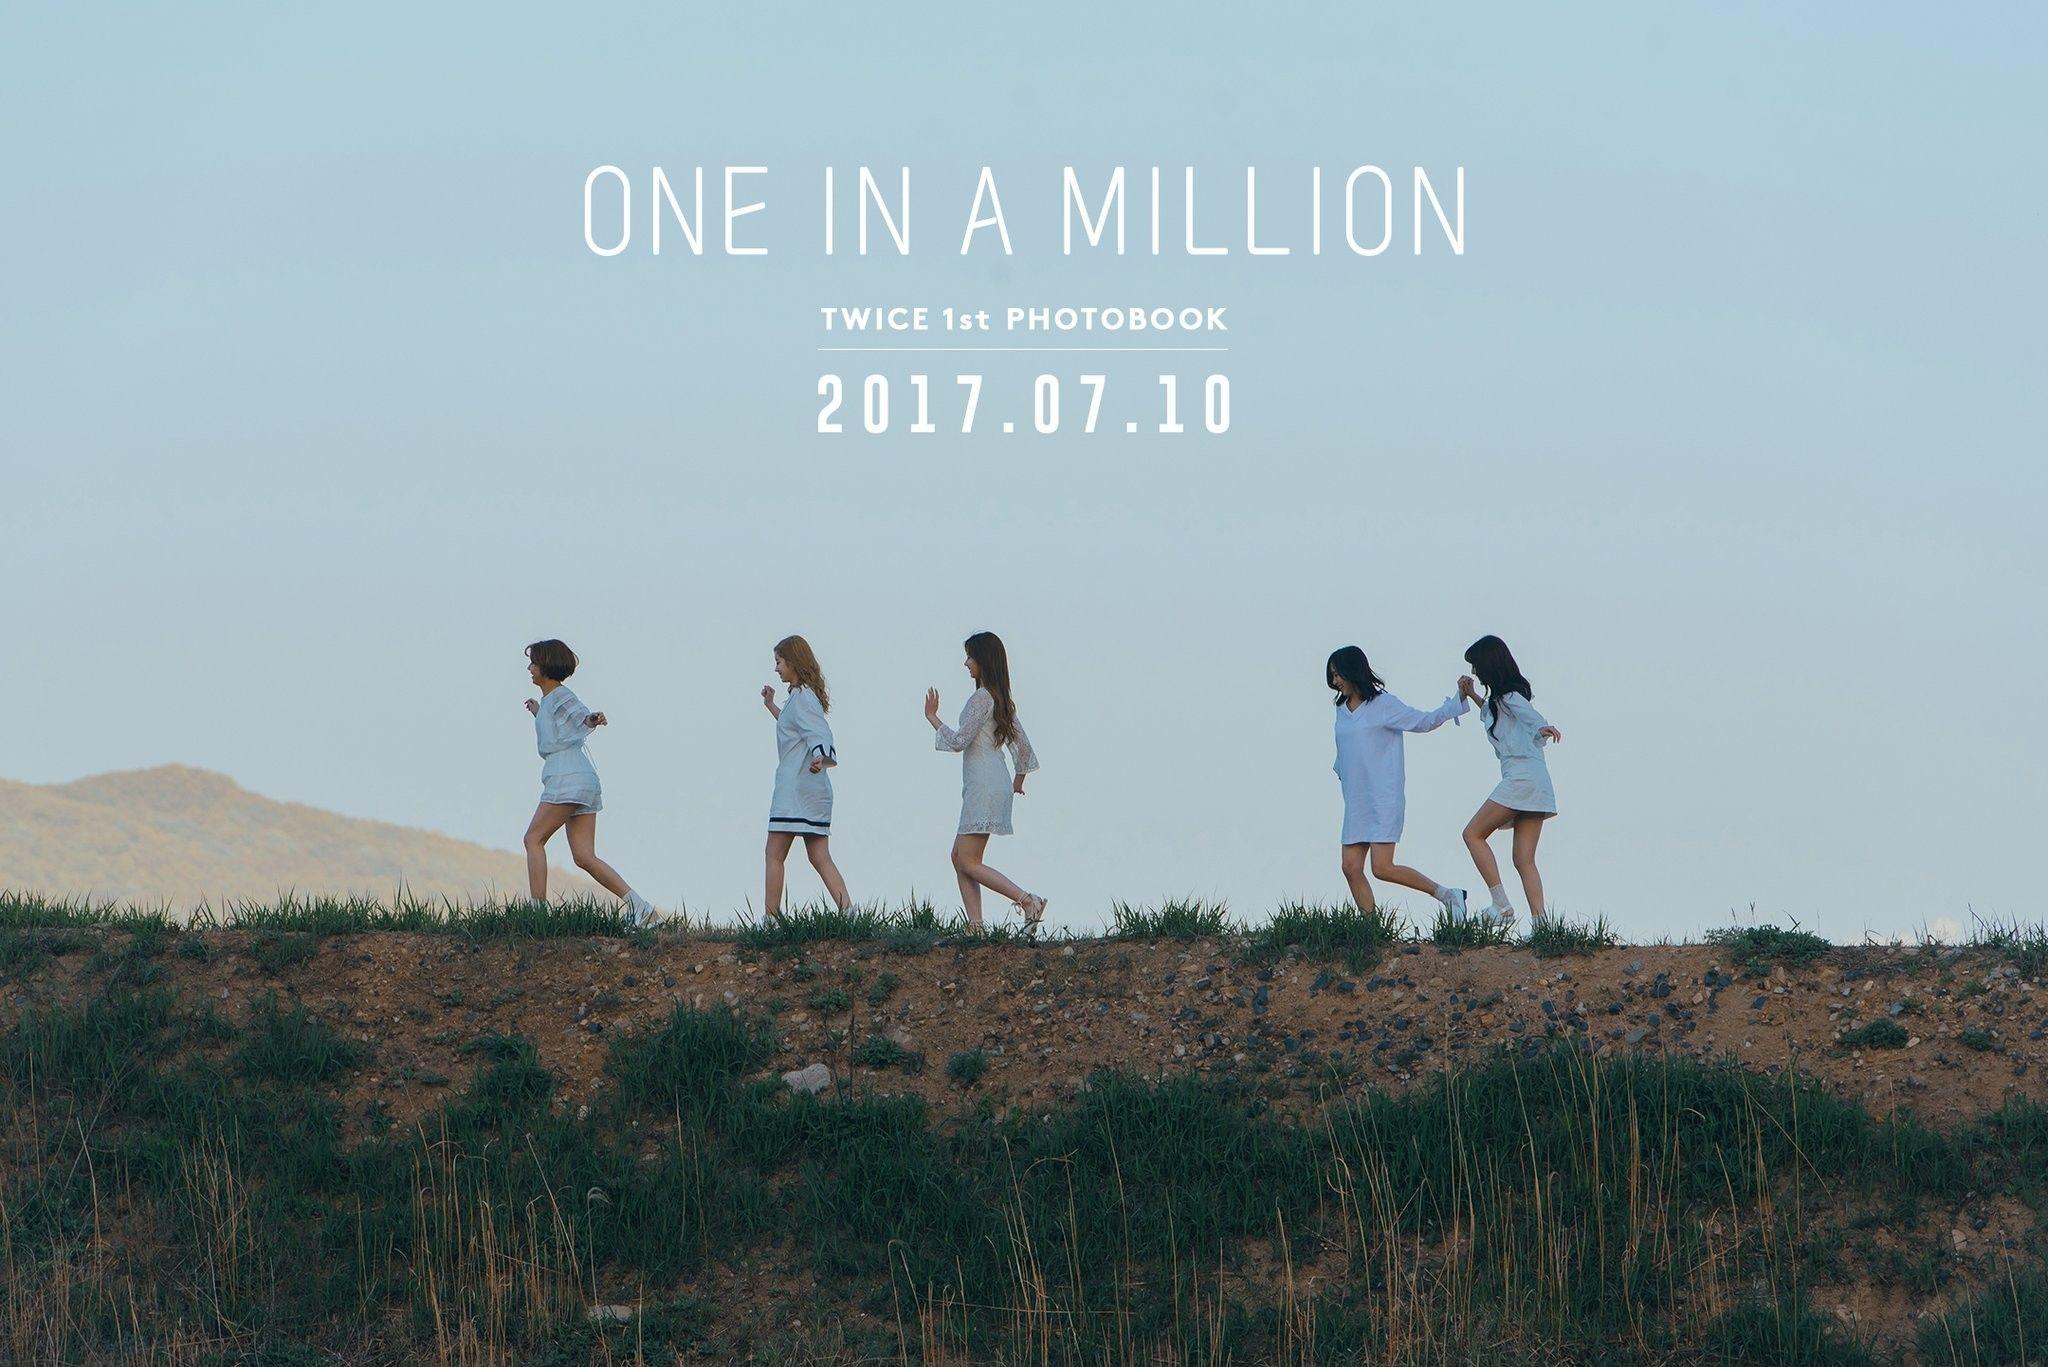 Twice 1st Photobook One In A Million 2017 07 10 Twice 트와이스